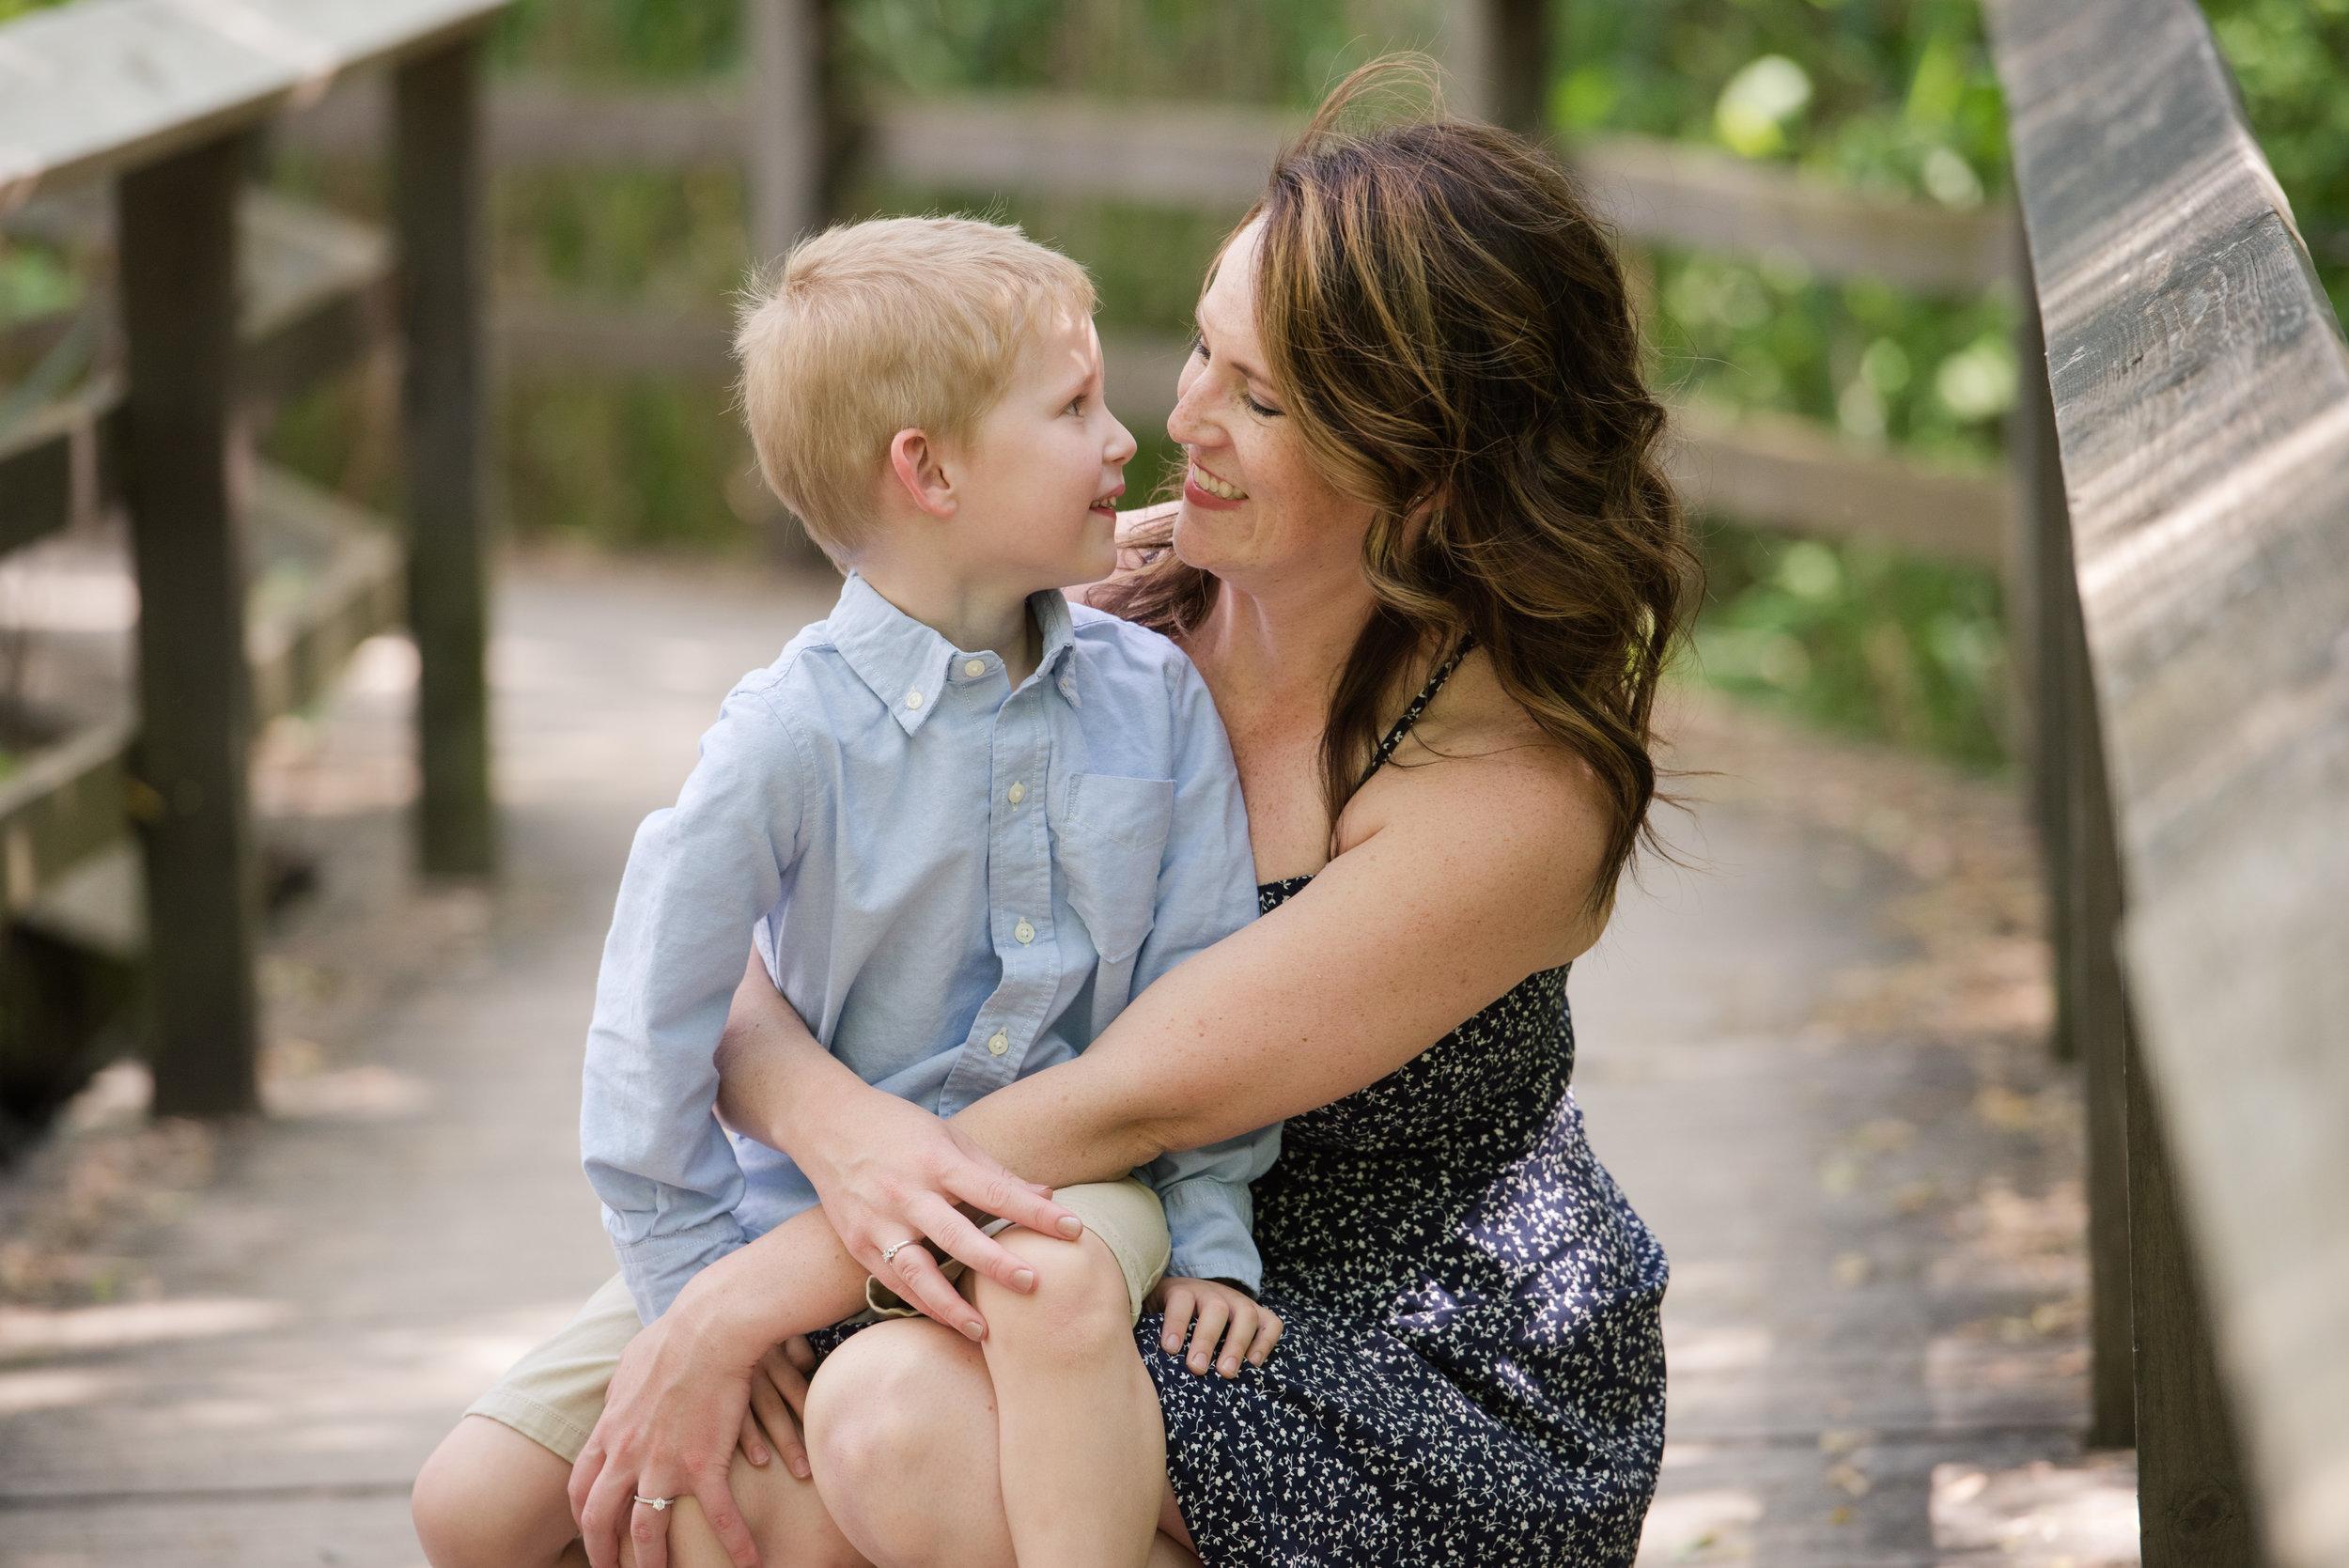 GALLERY-2019-6-9 Kaitlin, Justin & Liam Engagement 0701 100.jpg